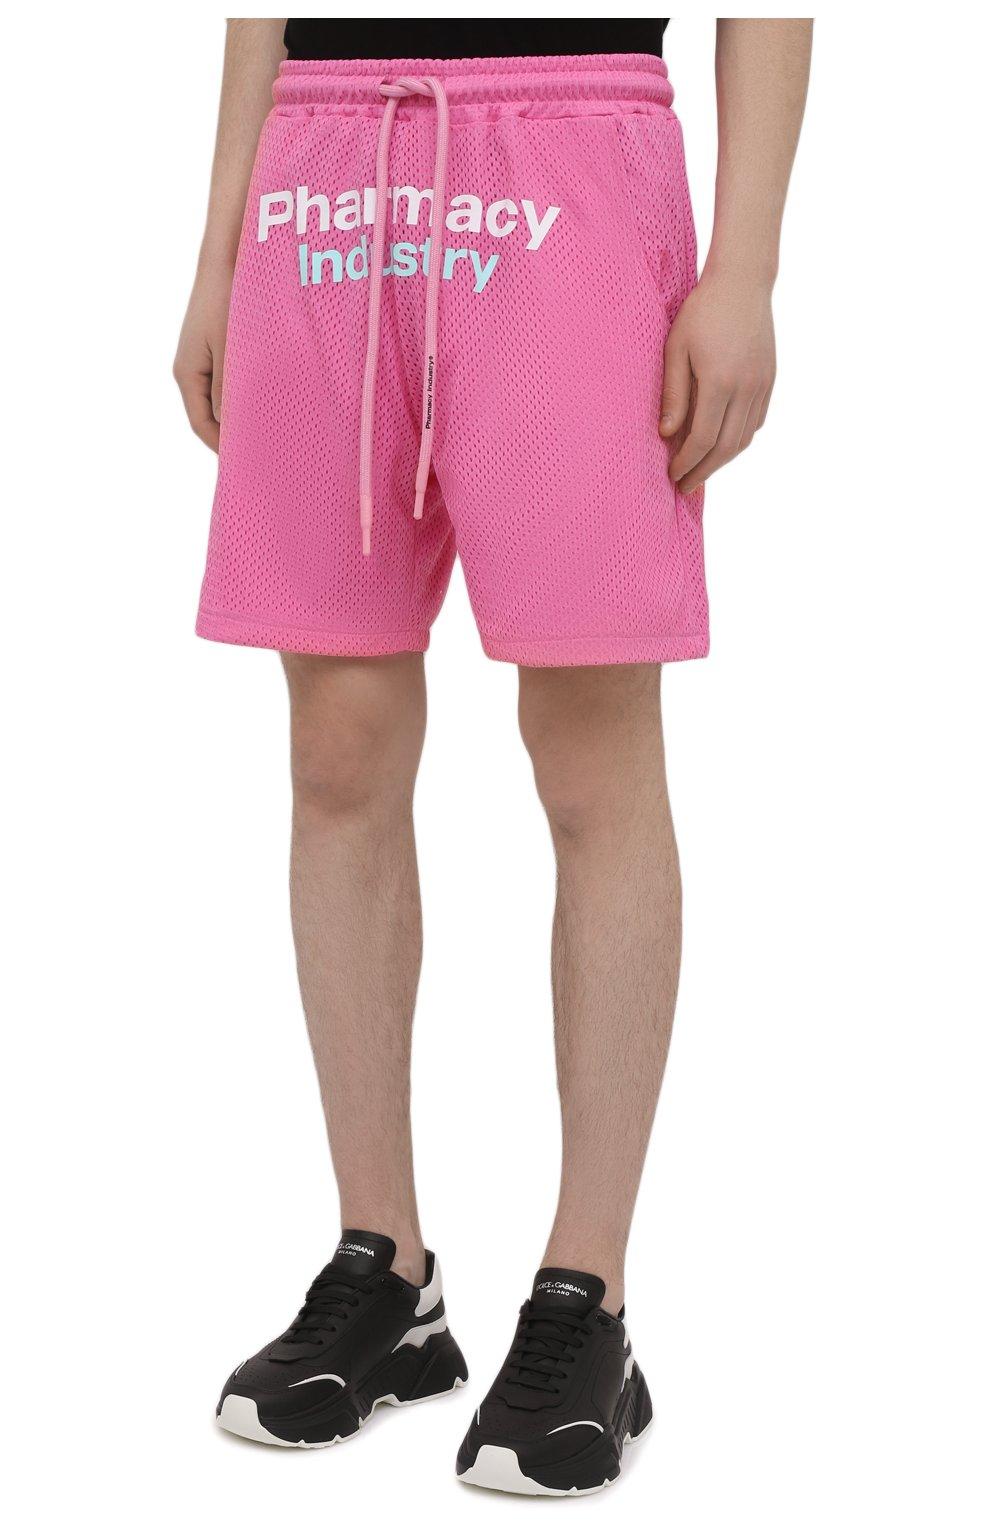 Мужские шорты PHARMACY INDUSTRY розового цвета, арт. PHM230 | Фото 3